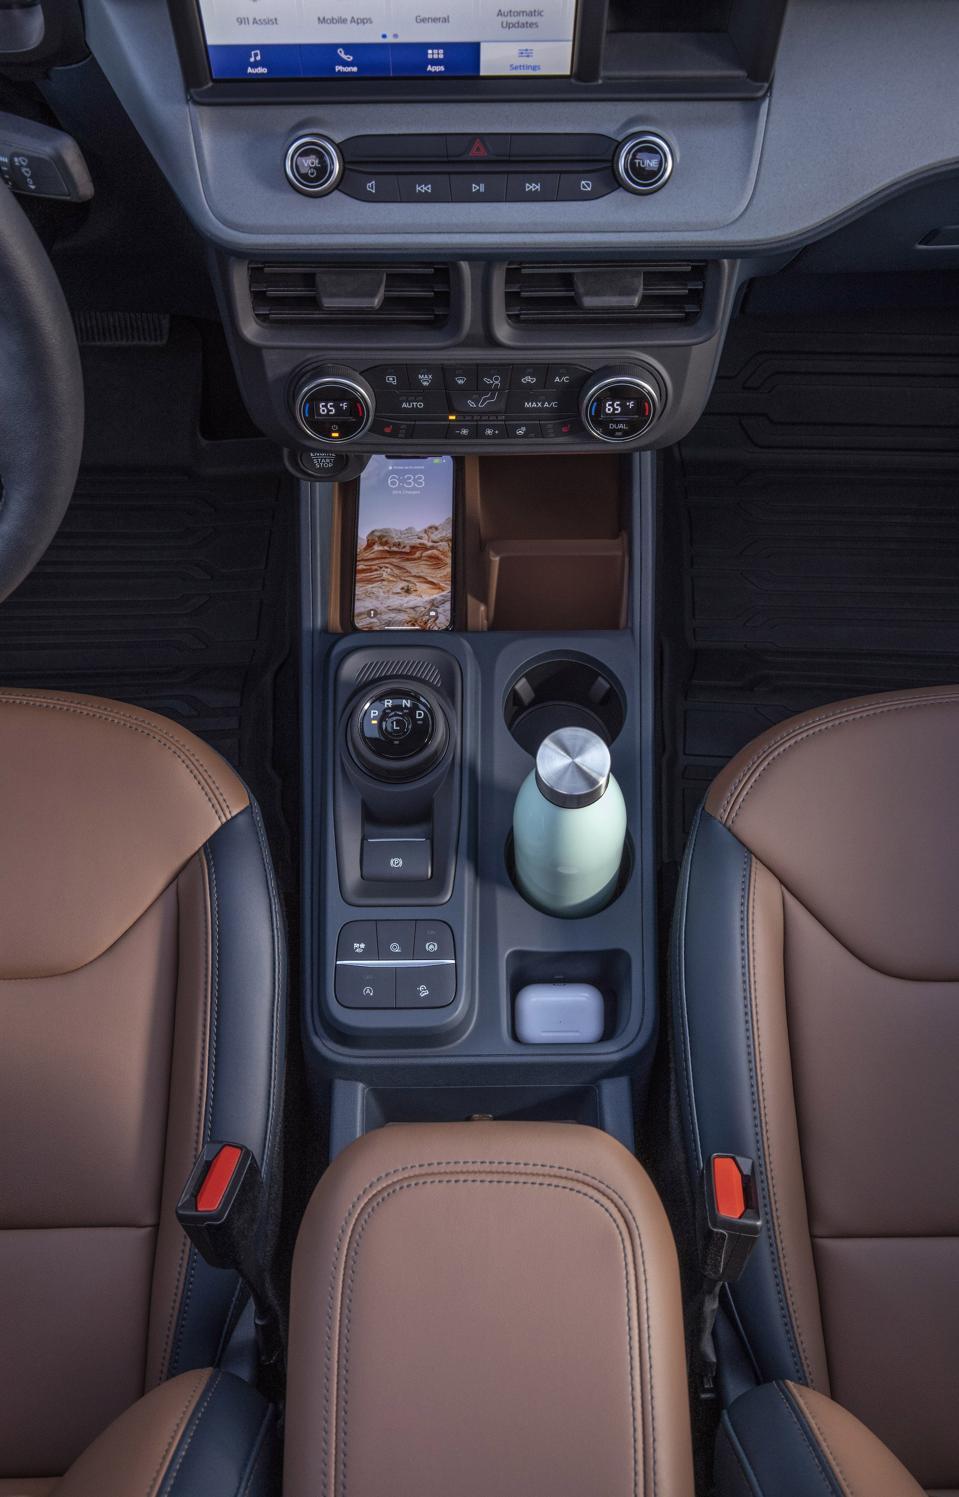 2022 Ford Maverick Console